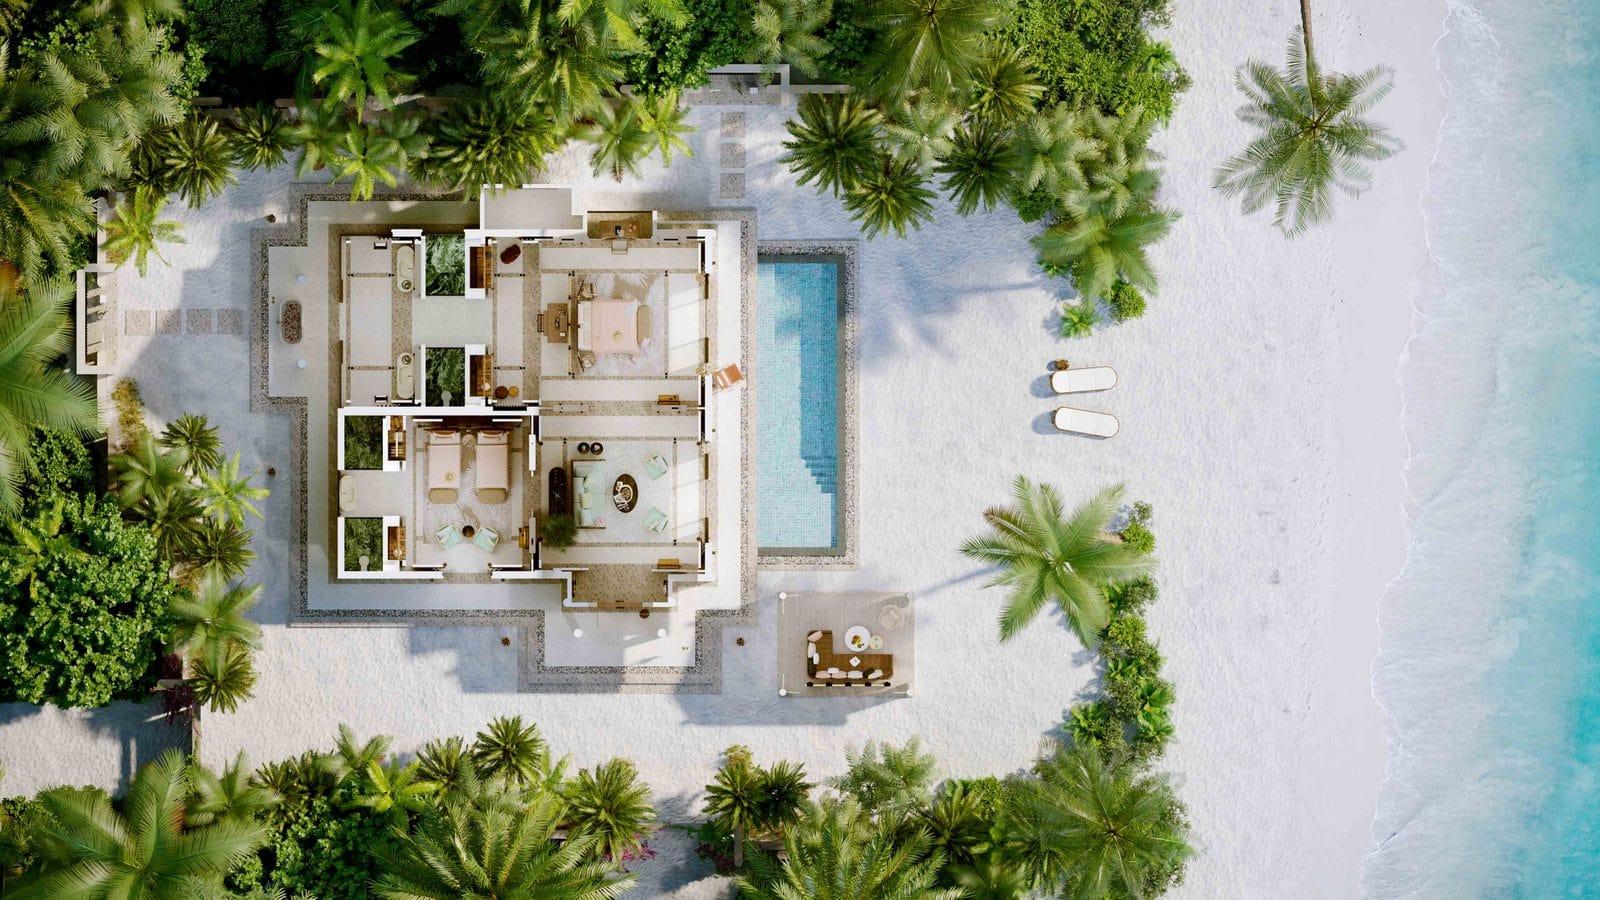 Мальдивы, отель Joali Maldives, план-схема номера Two Bed Room Luxury Beach Villa with Two Pool